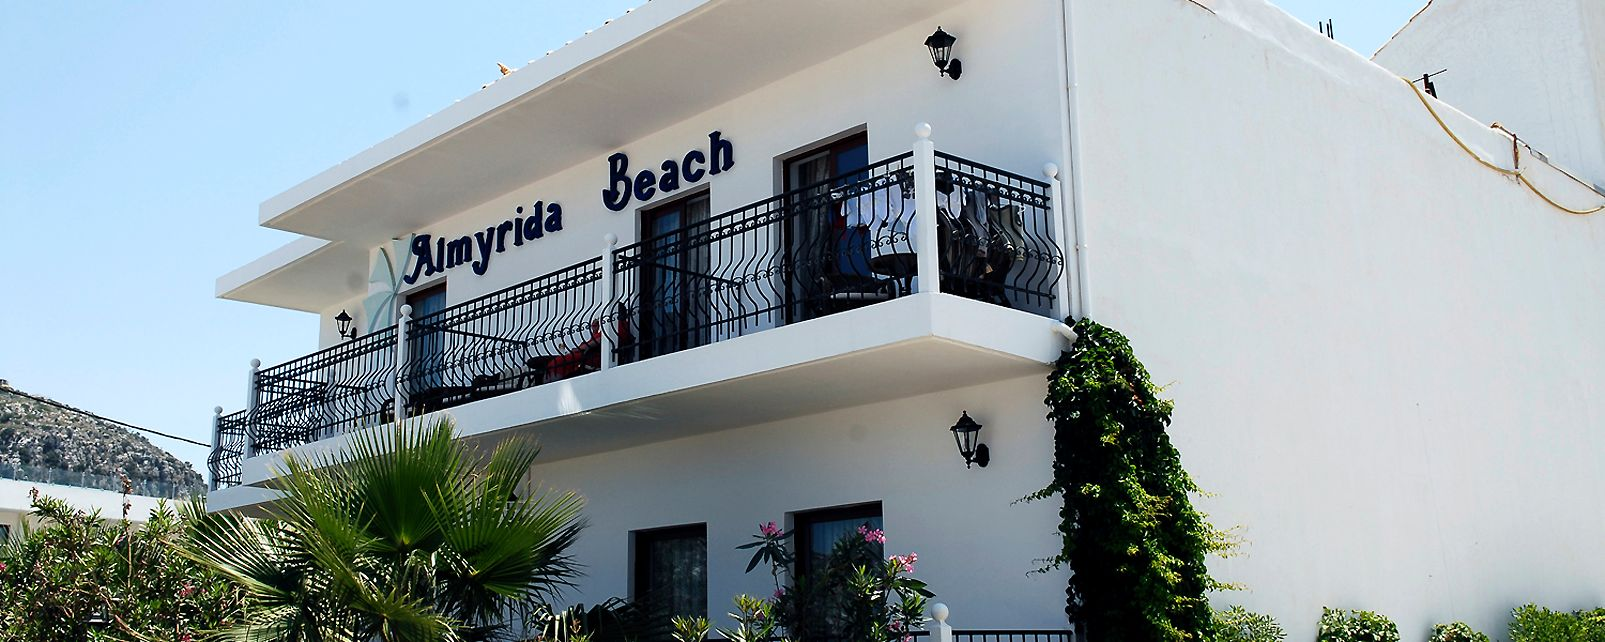 Hôtel Almyrida Beach Studios